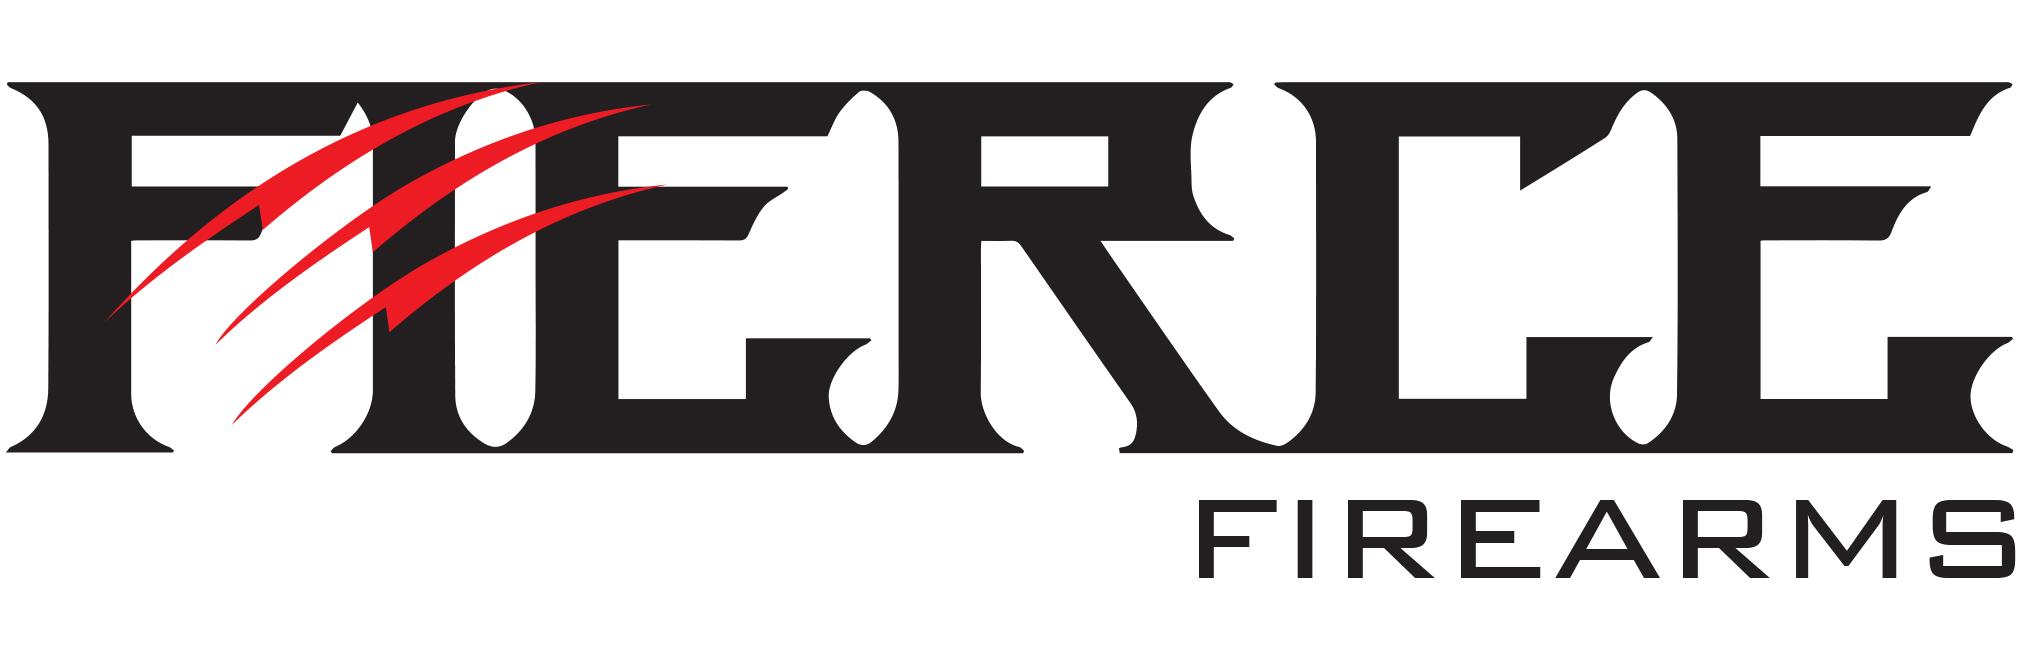 Fierce CT Edge - 30 Nosler & Zeiss Conquest V6 3-18x50 & SIG Kilo 2400ABS